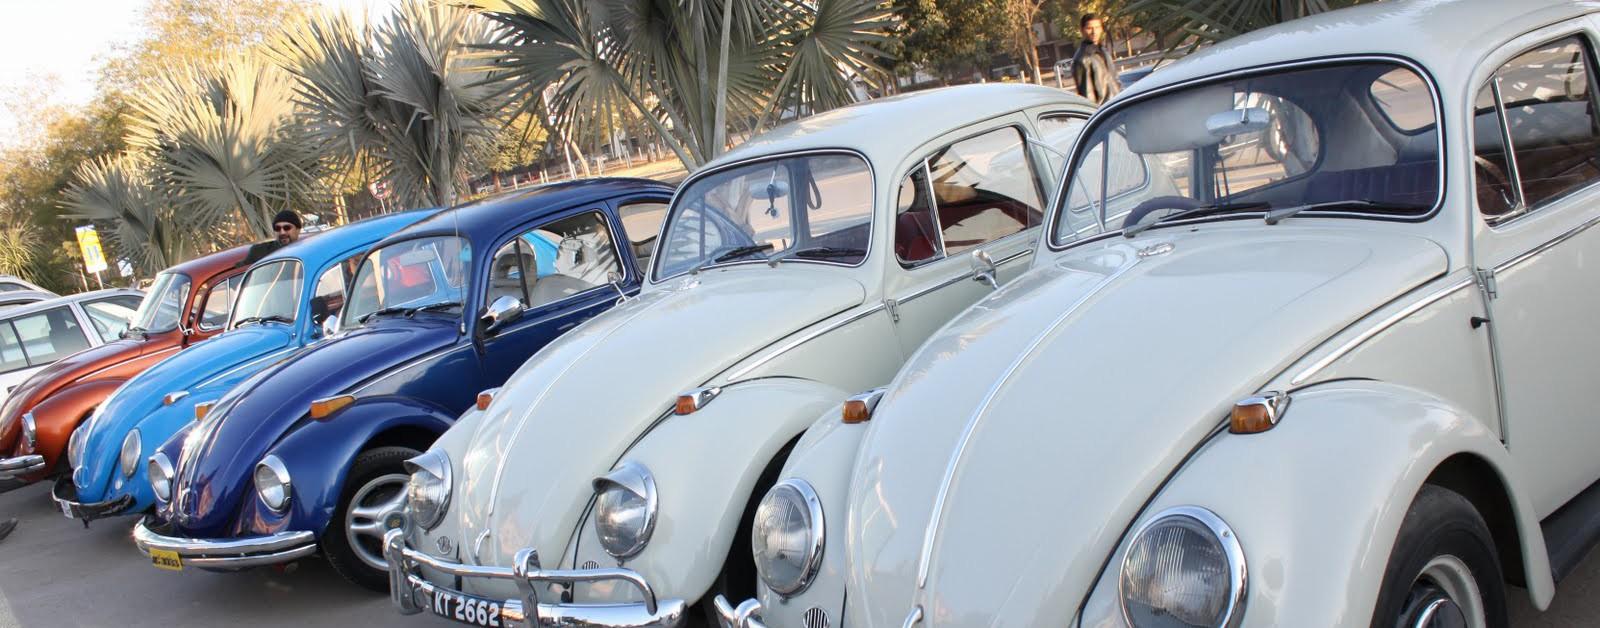 historias de coches en pakistn